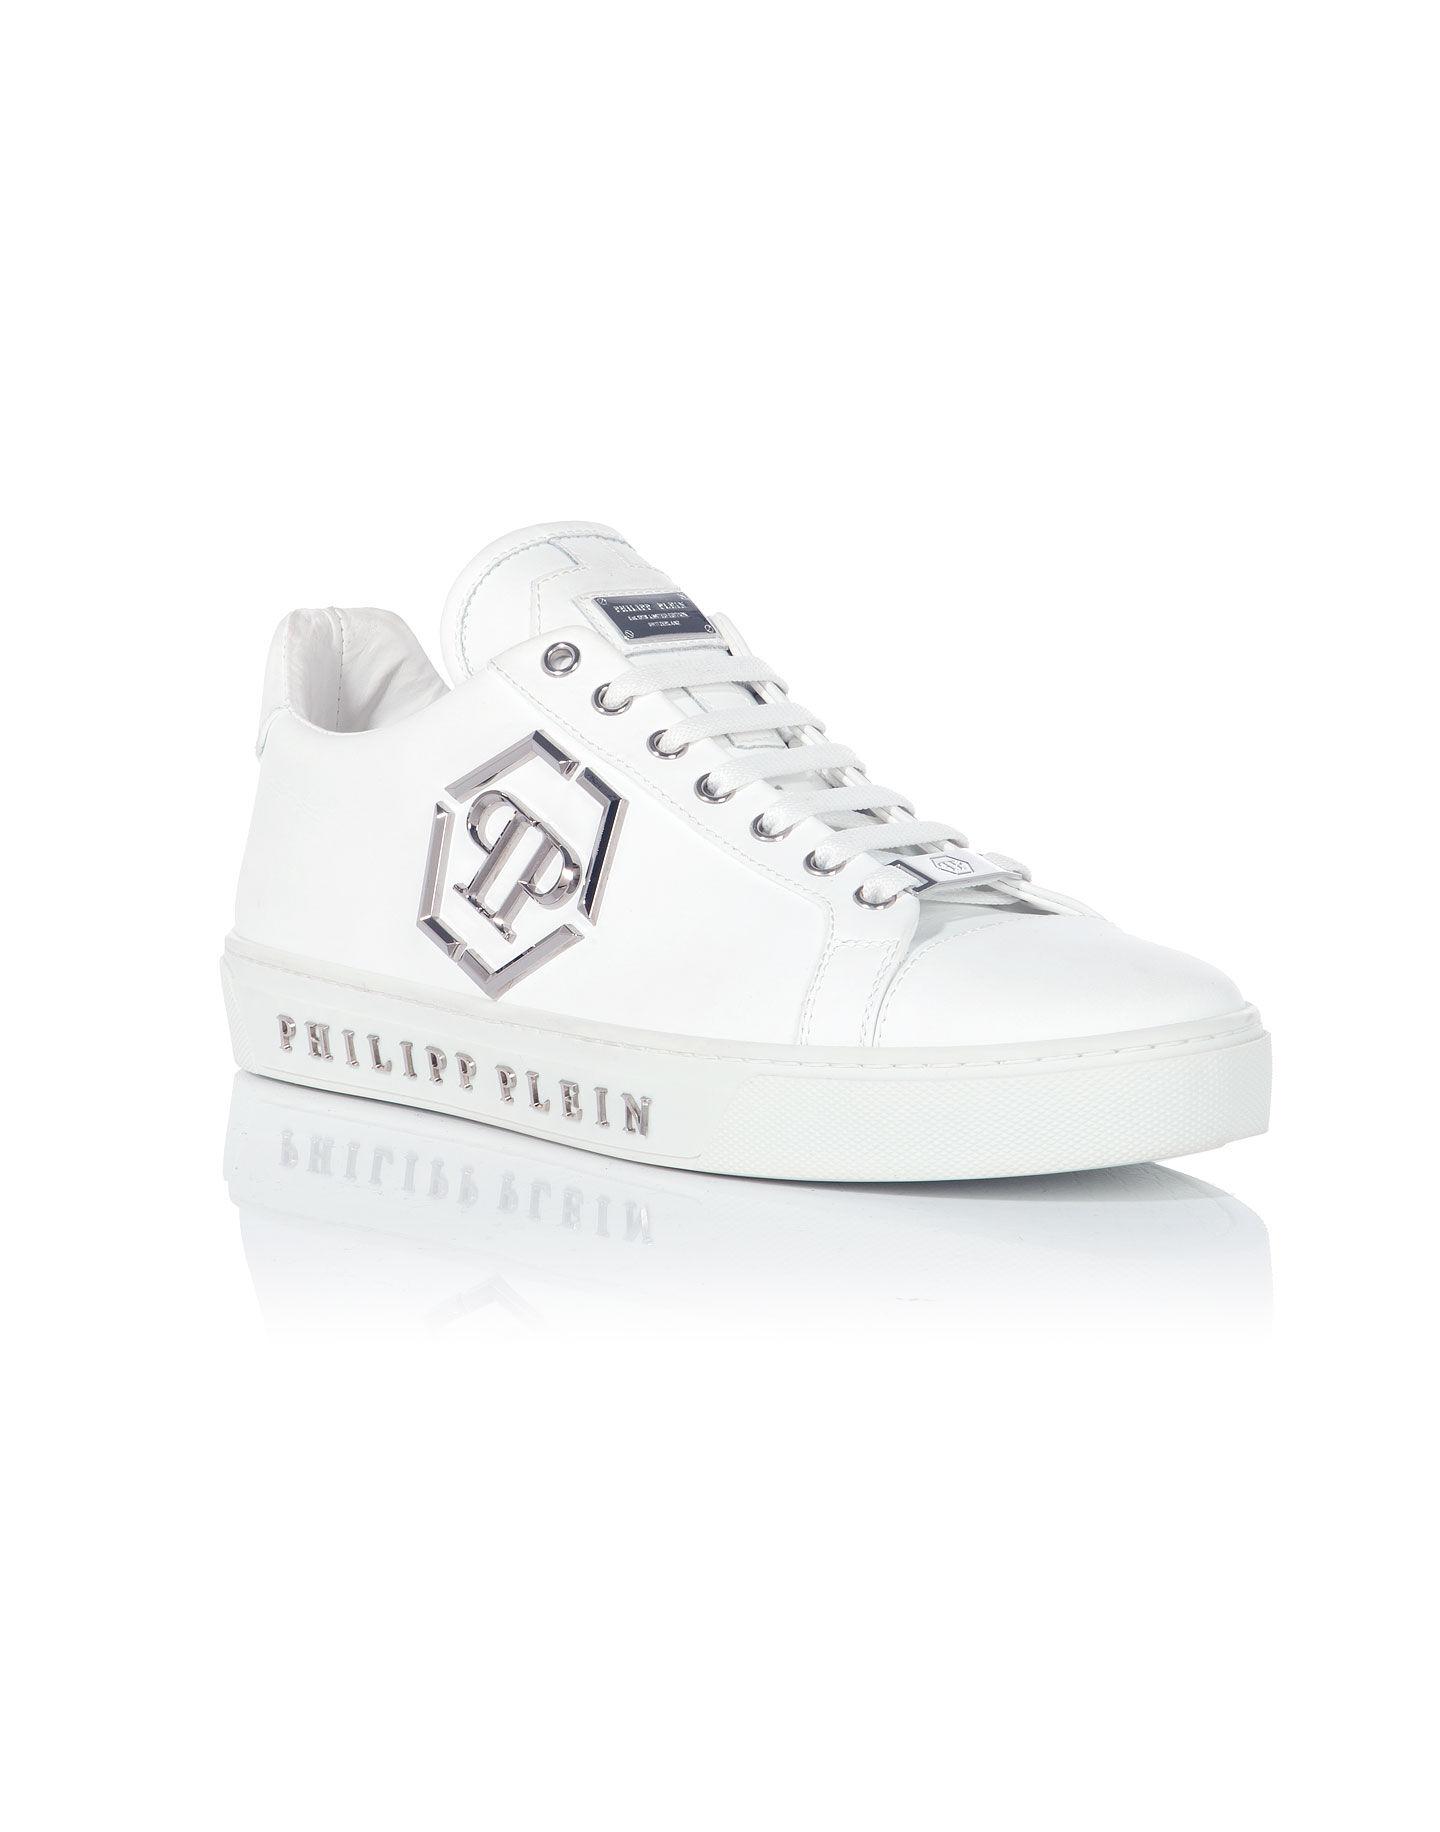 Sneakers Lo Queensland Chaussures Top Hommes pMqGUzVS